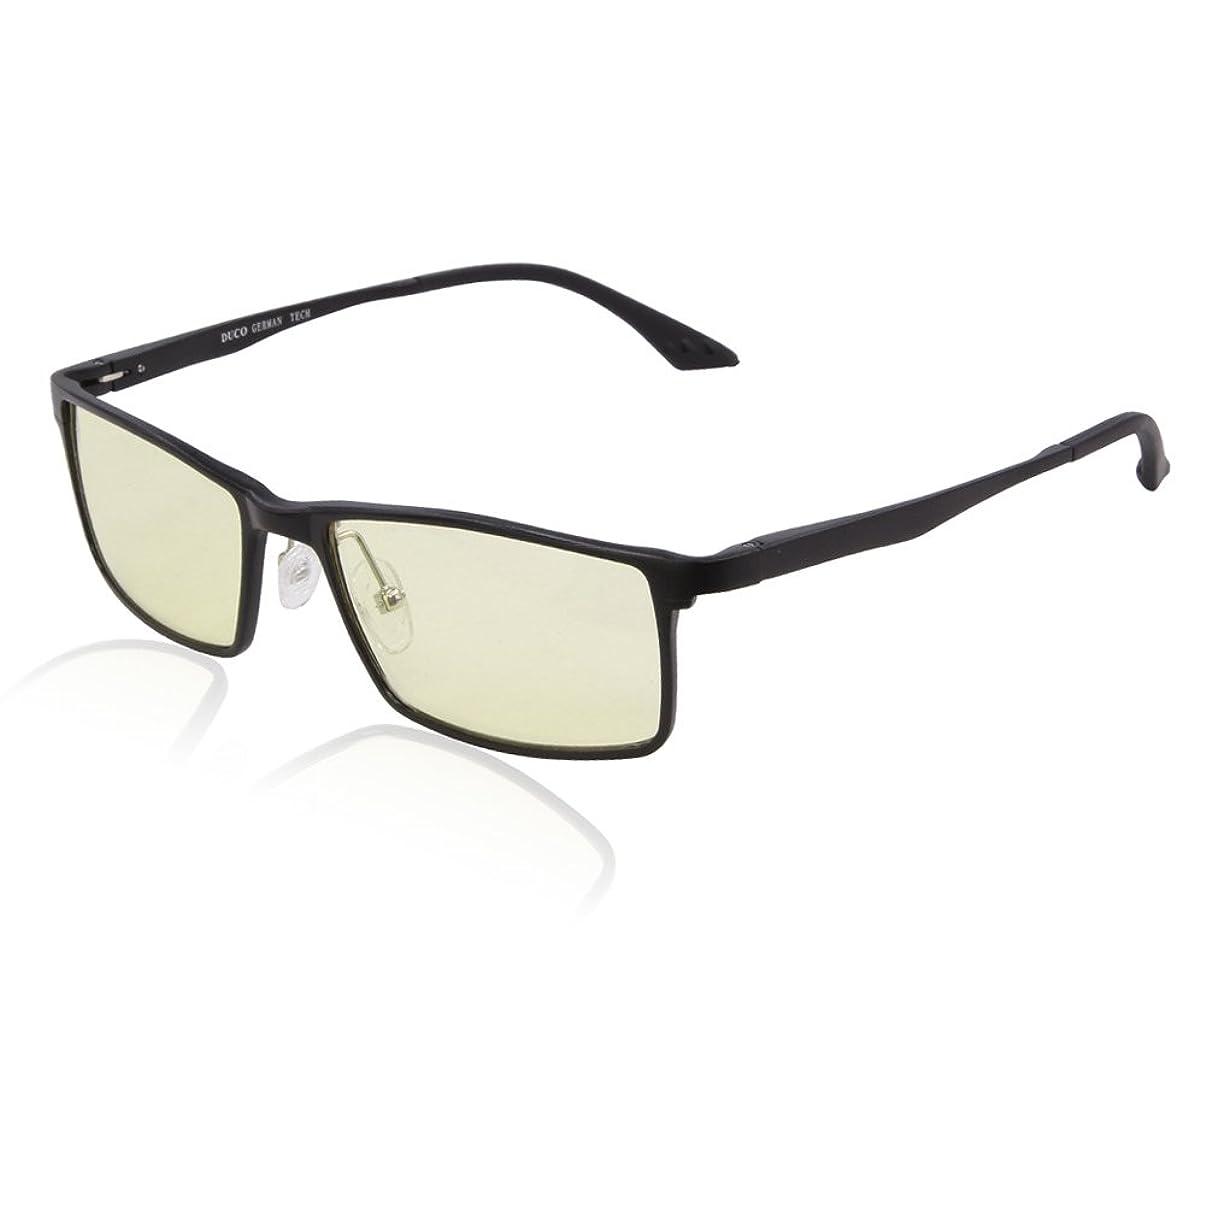 DUCO Optiks Full Rim Video Computer Gaming Glasses with Amber Lens Tint 2895